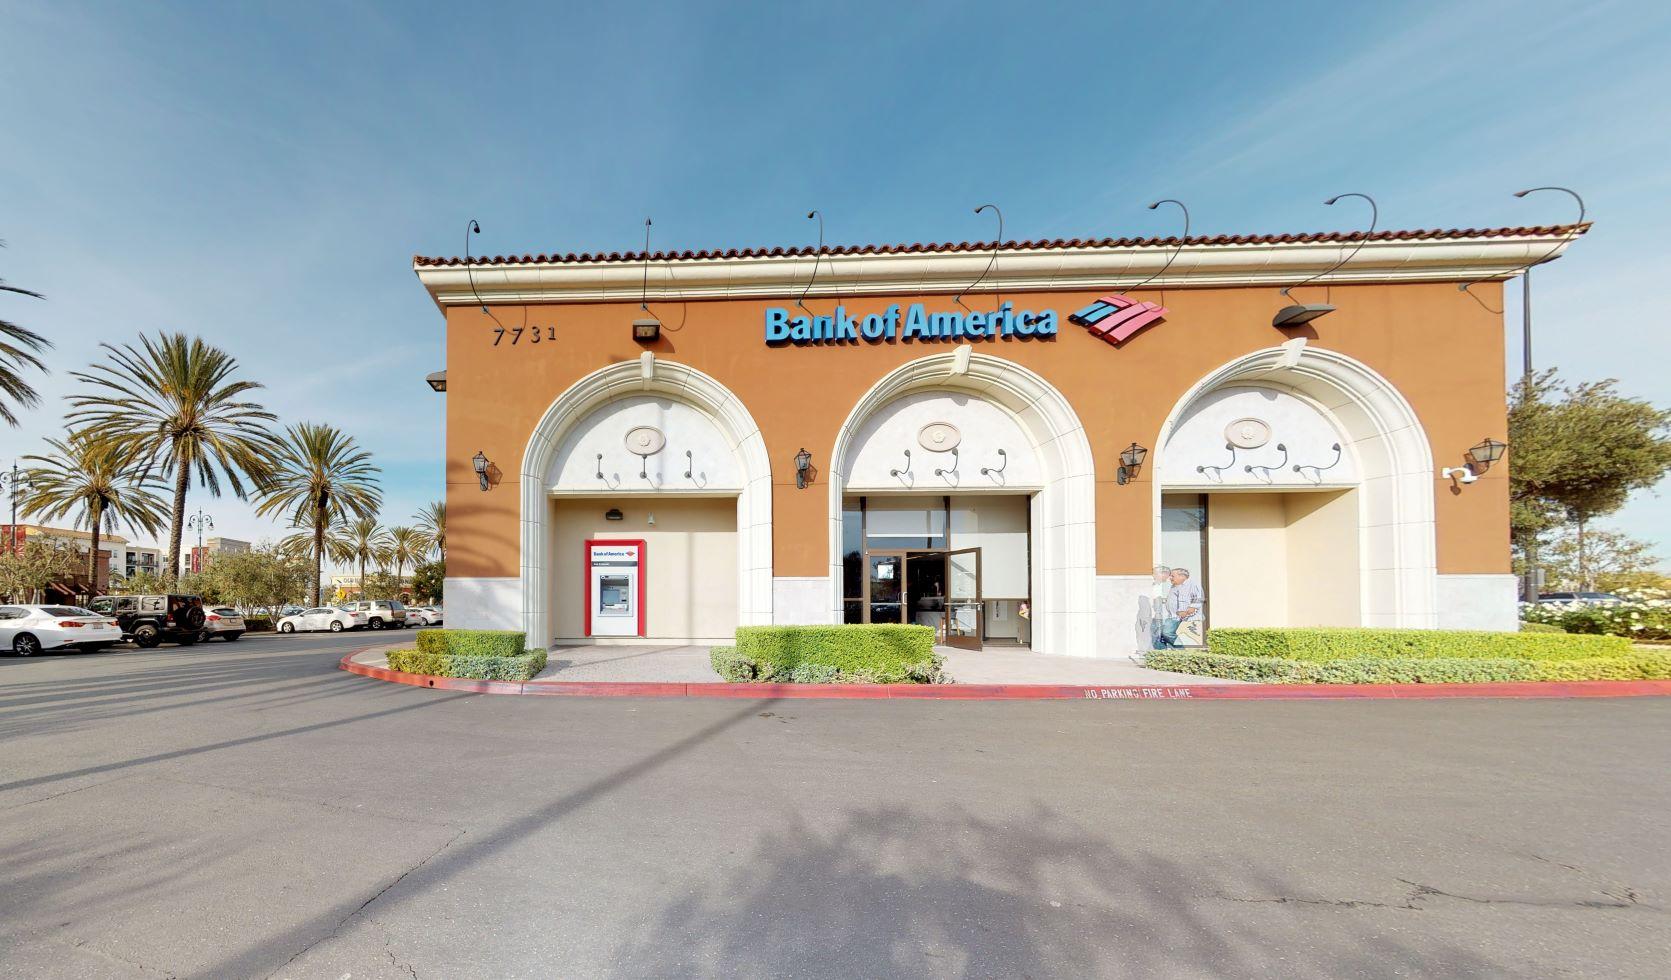 Bank of America financial center with drive-thru ATM | 7731 Edinger Ave, Huntington Beach, CA 92647